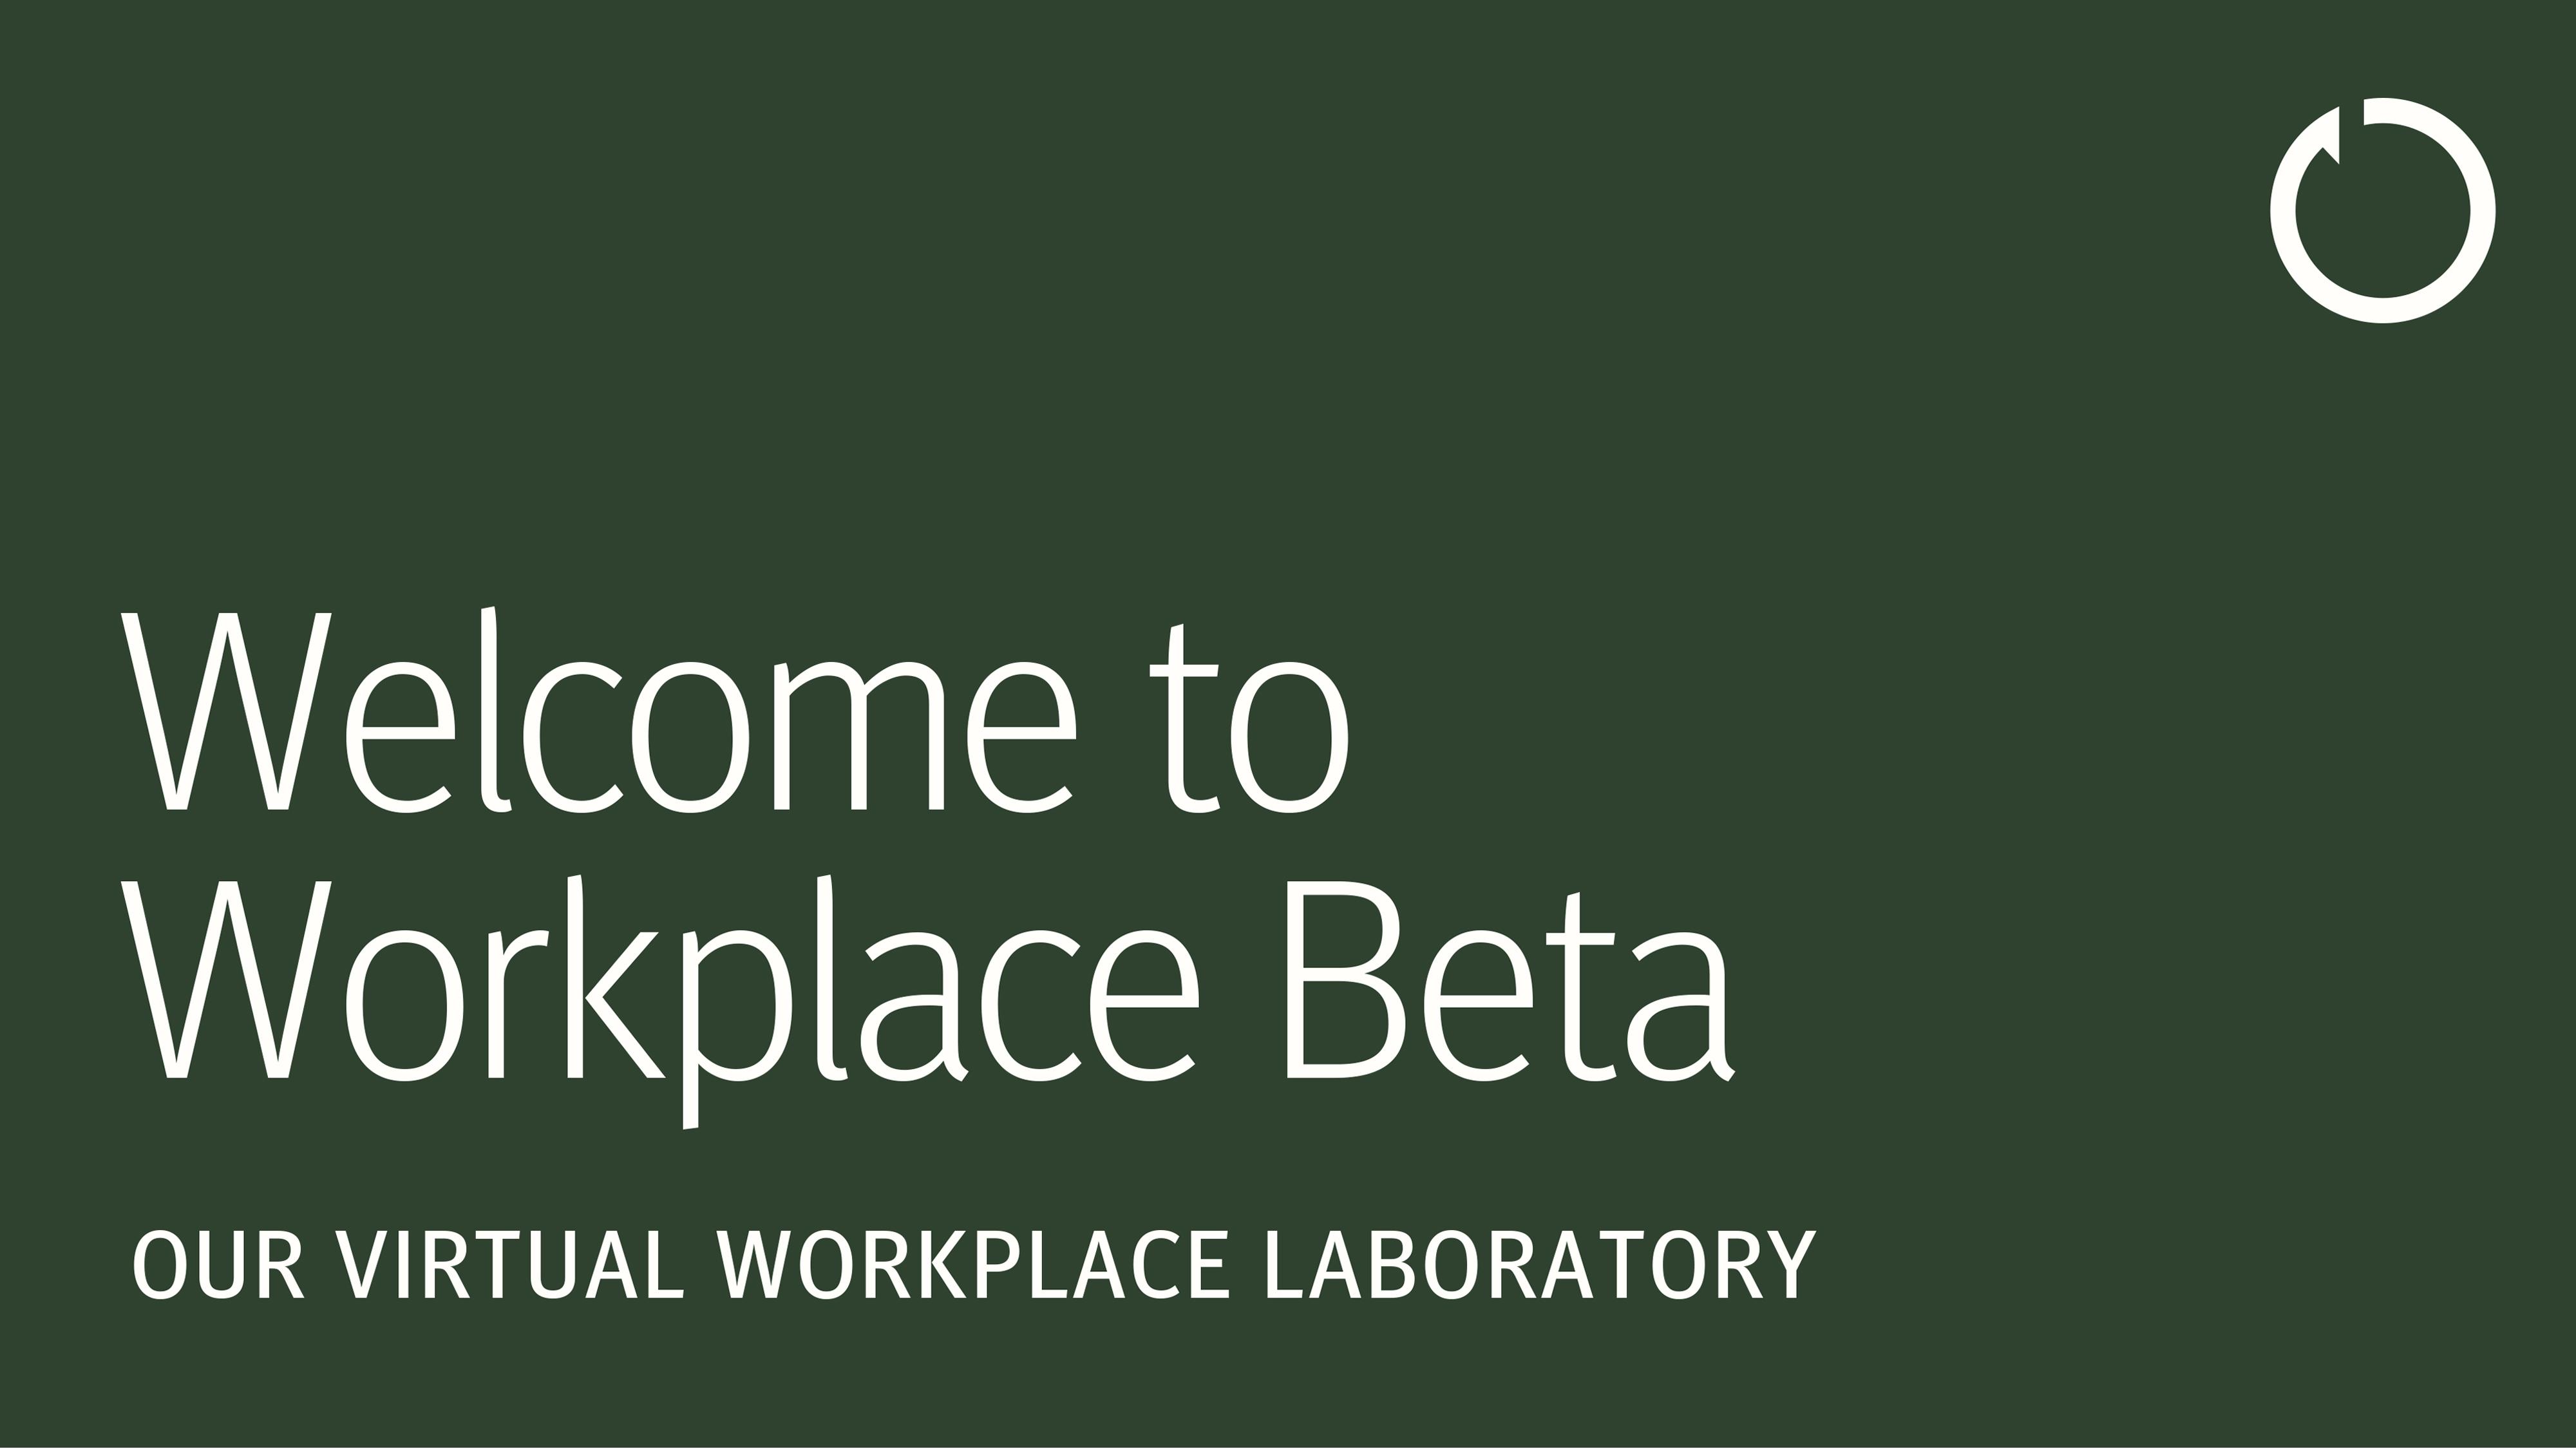 Pivot Workplace Beta Promo Video 05.28.2021